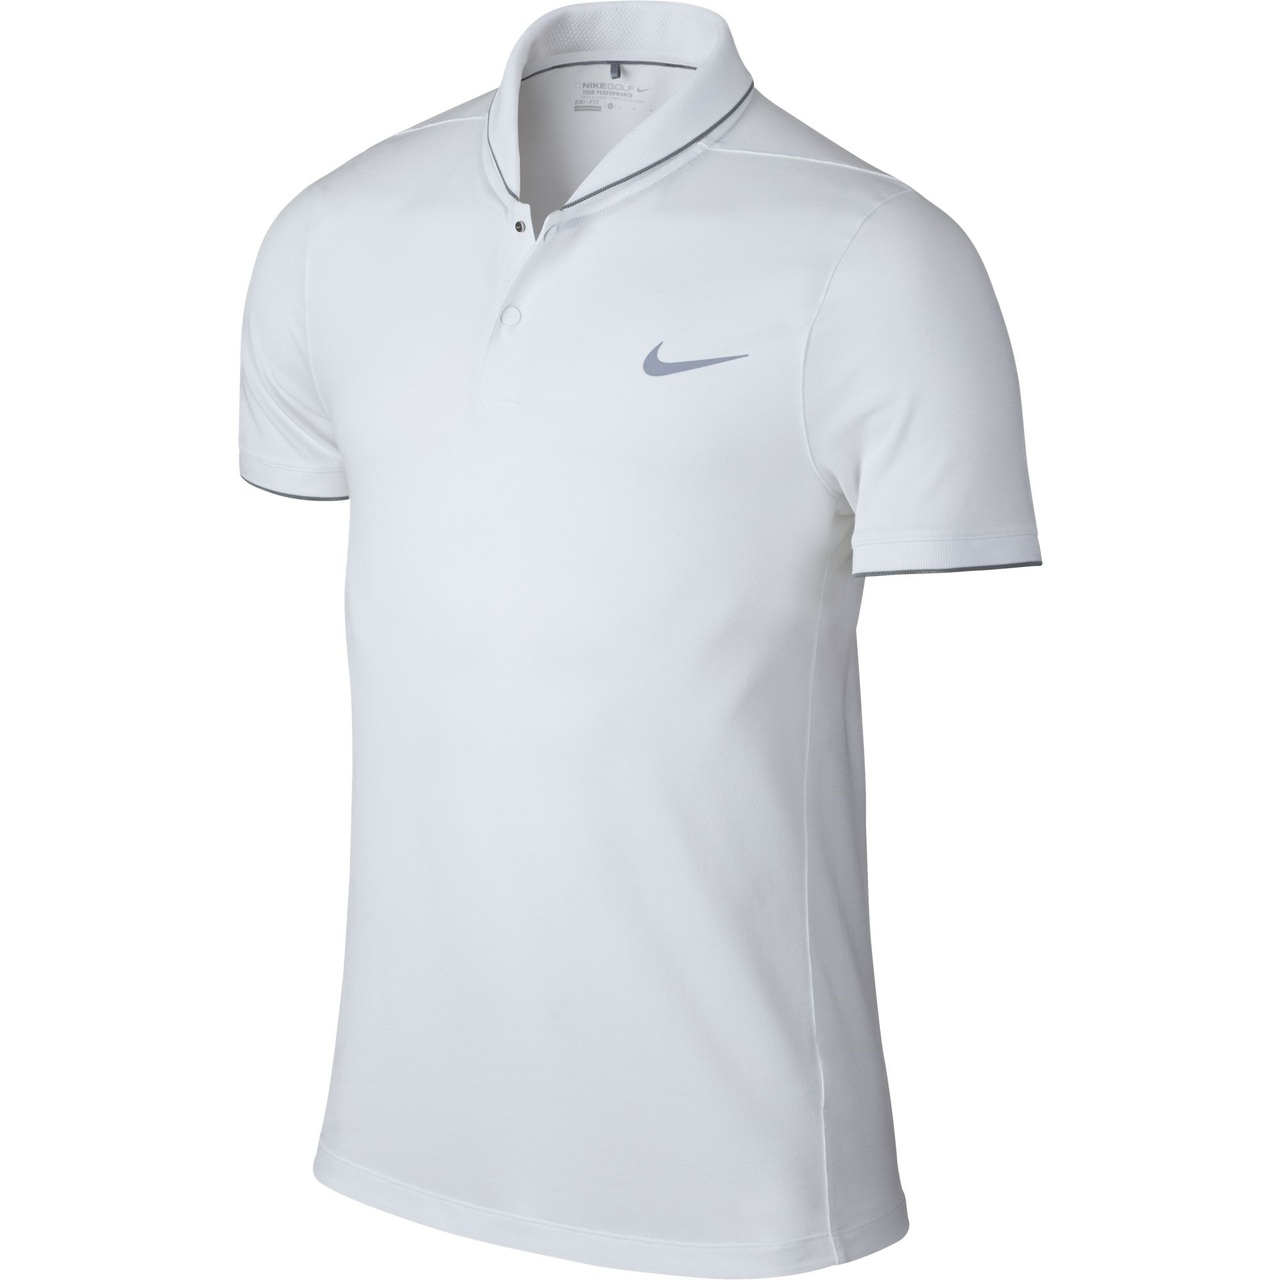 c8b9a180 Nike Golf MM Fly Roll Polo (Midnight Navy) XL - White